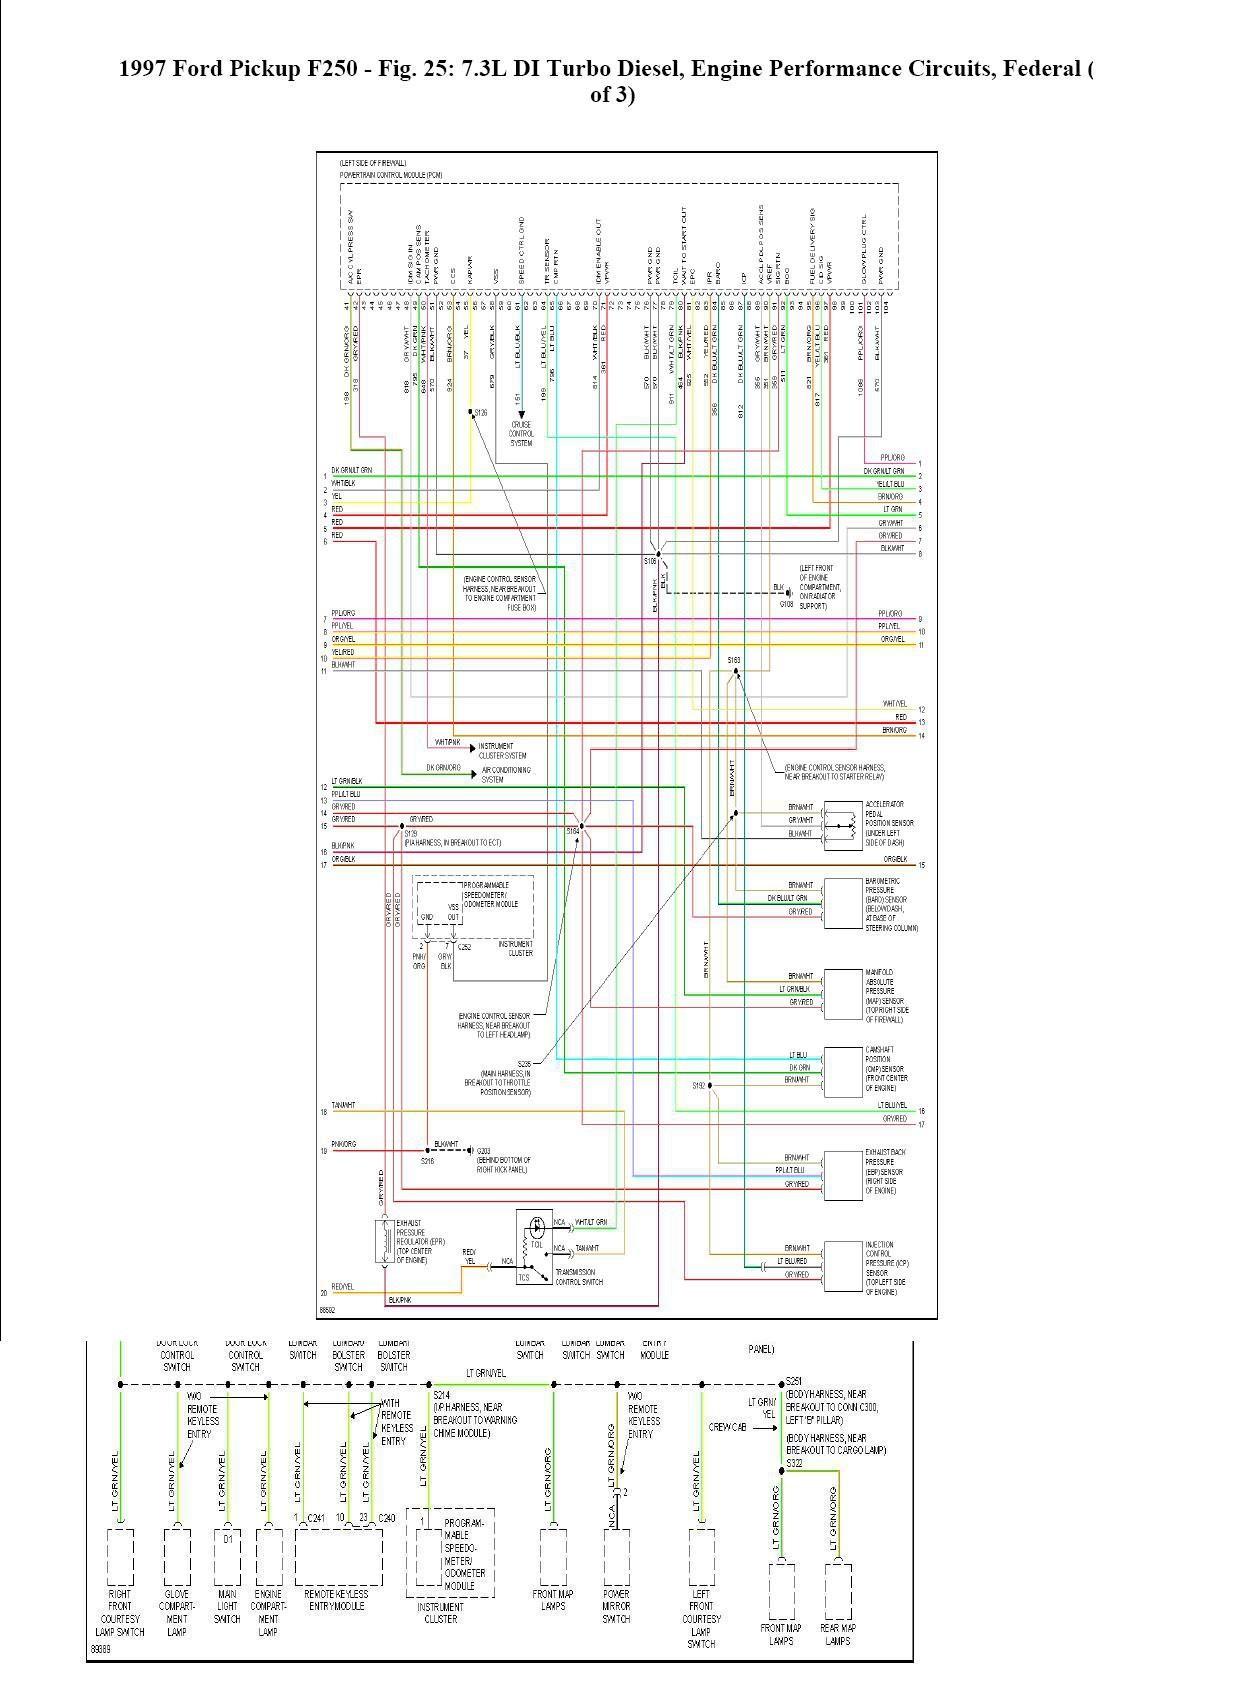 7 3 Powerstroke Engine Diagram F250 7 3l Wiring Diagram Wiring Diagrams • Of 7 3 Powerstroke Engine Diagram